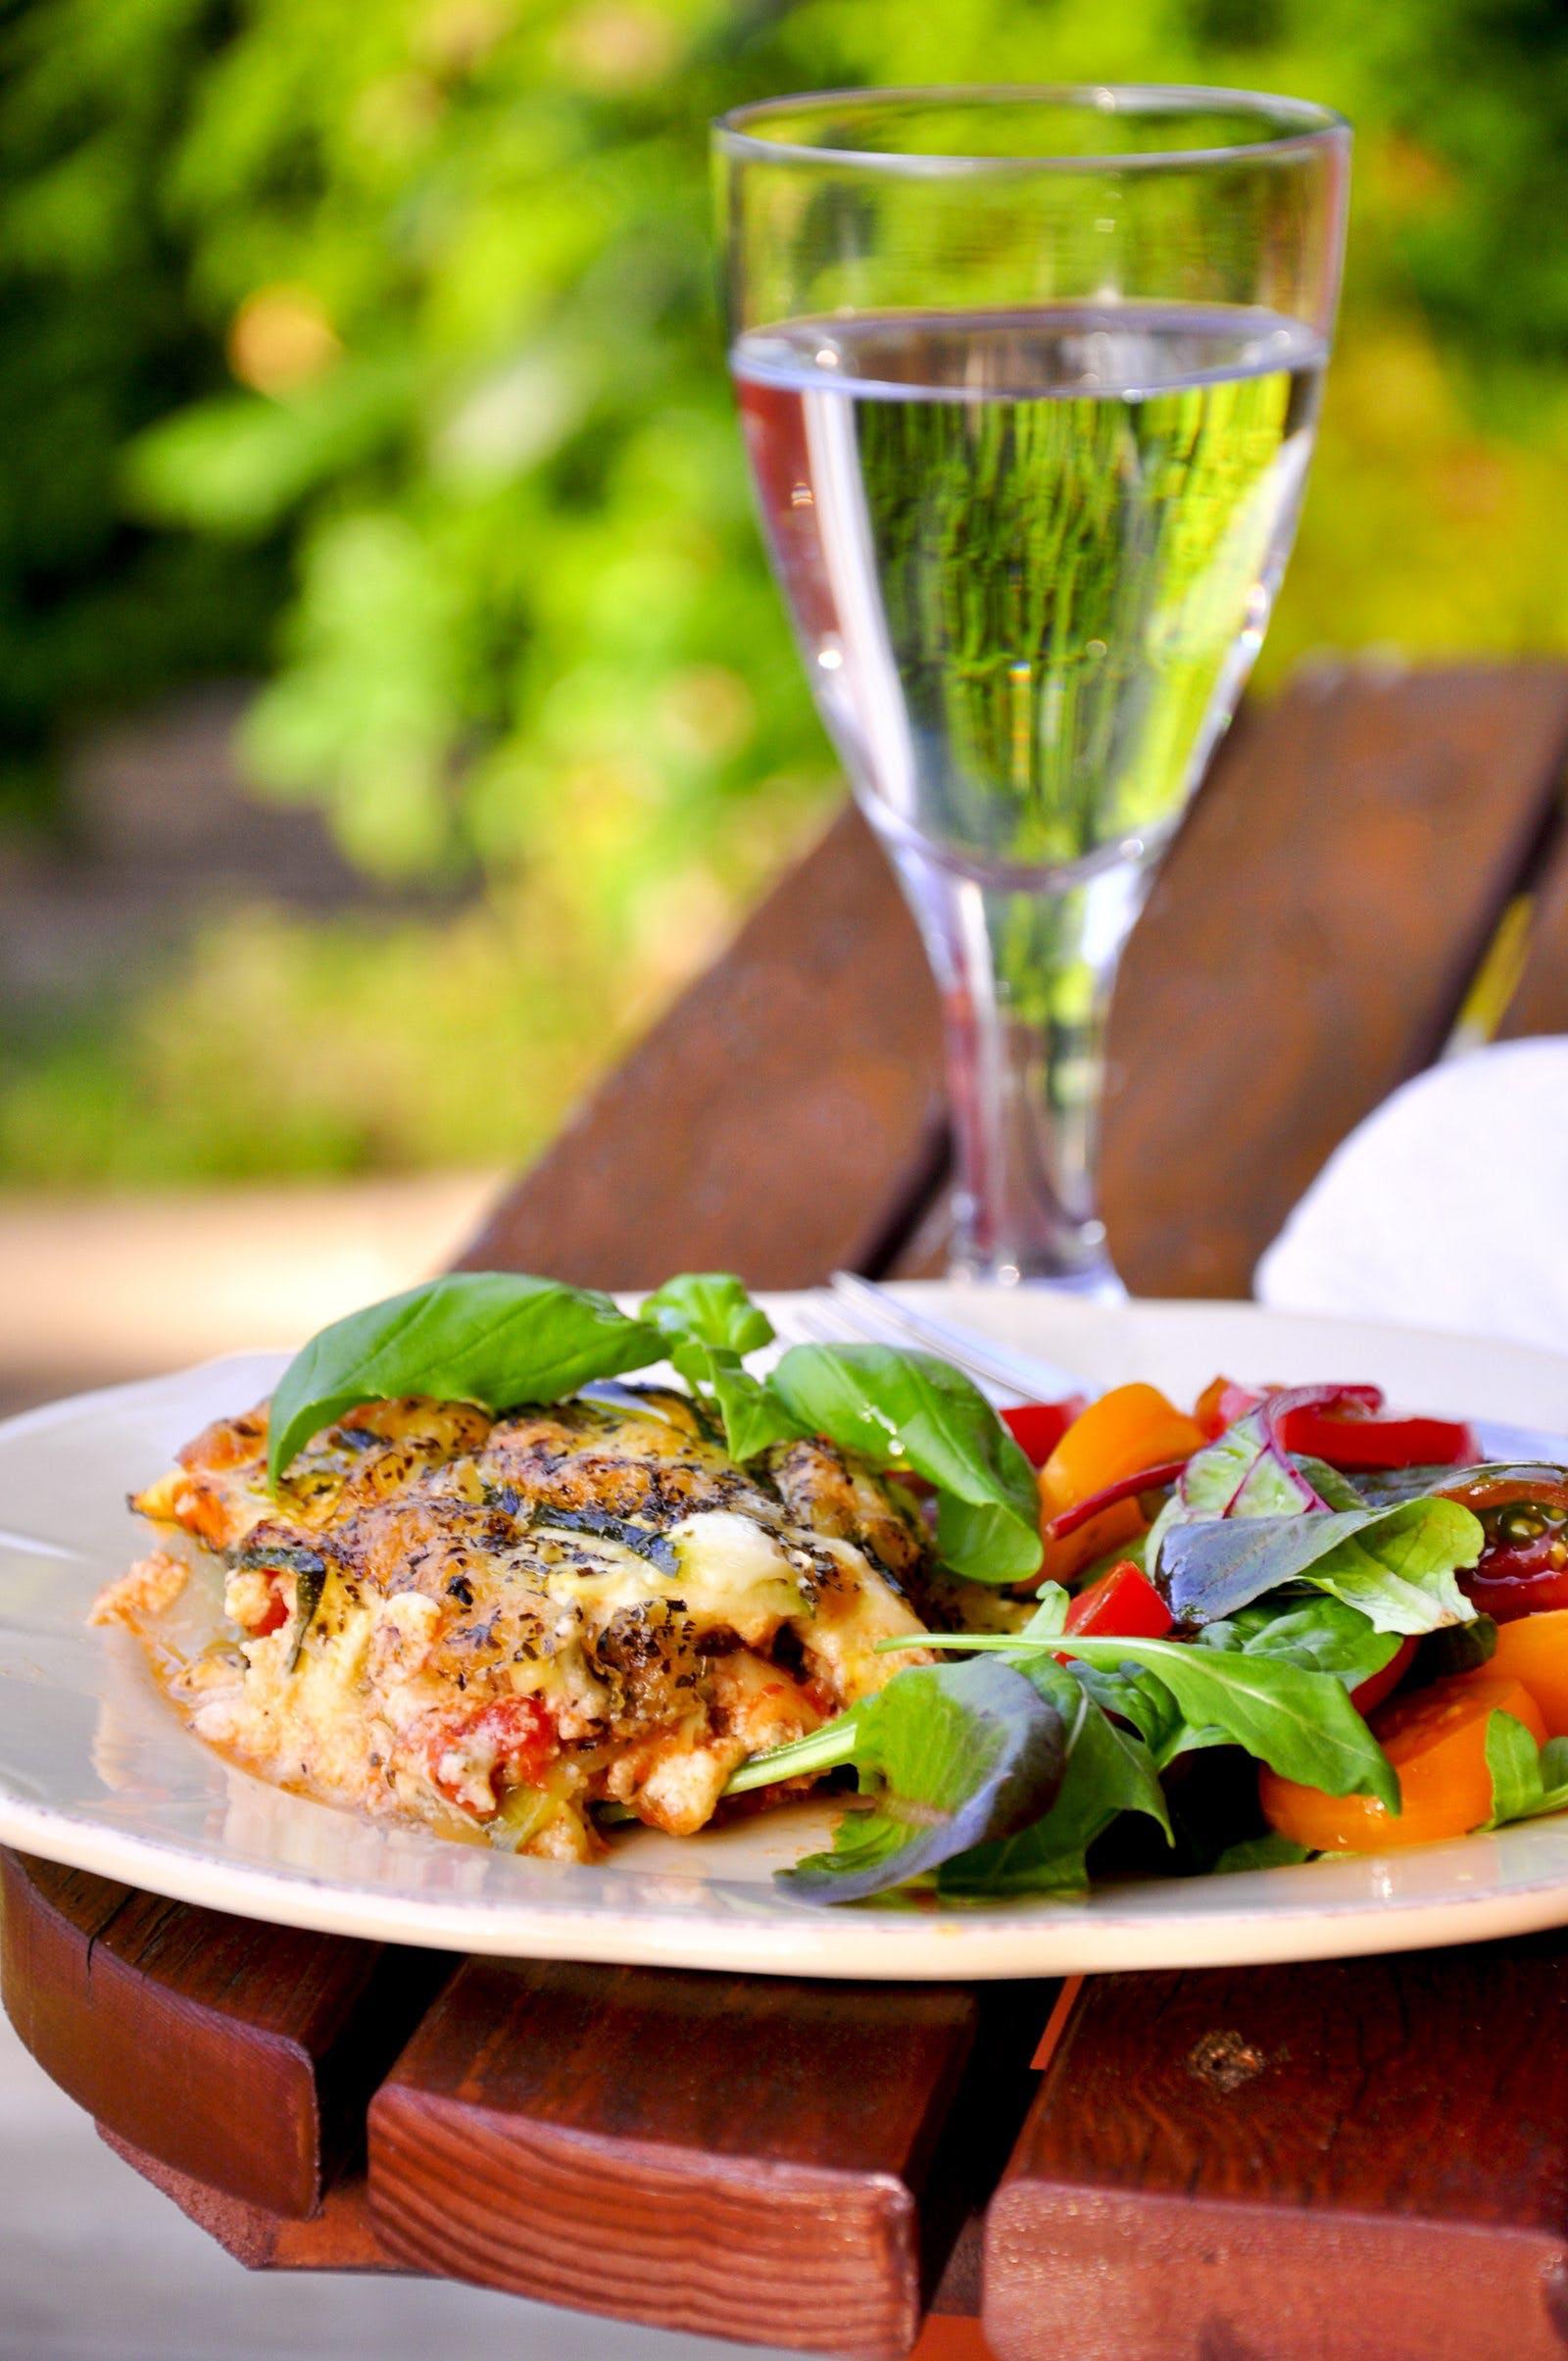 Jills söndagsmeny: Kardemummaostkaka, laxlåda och lasagne